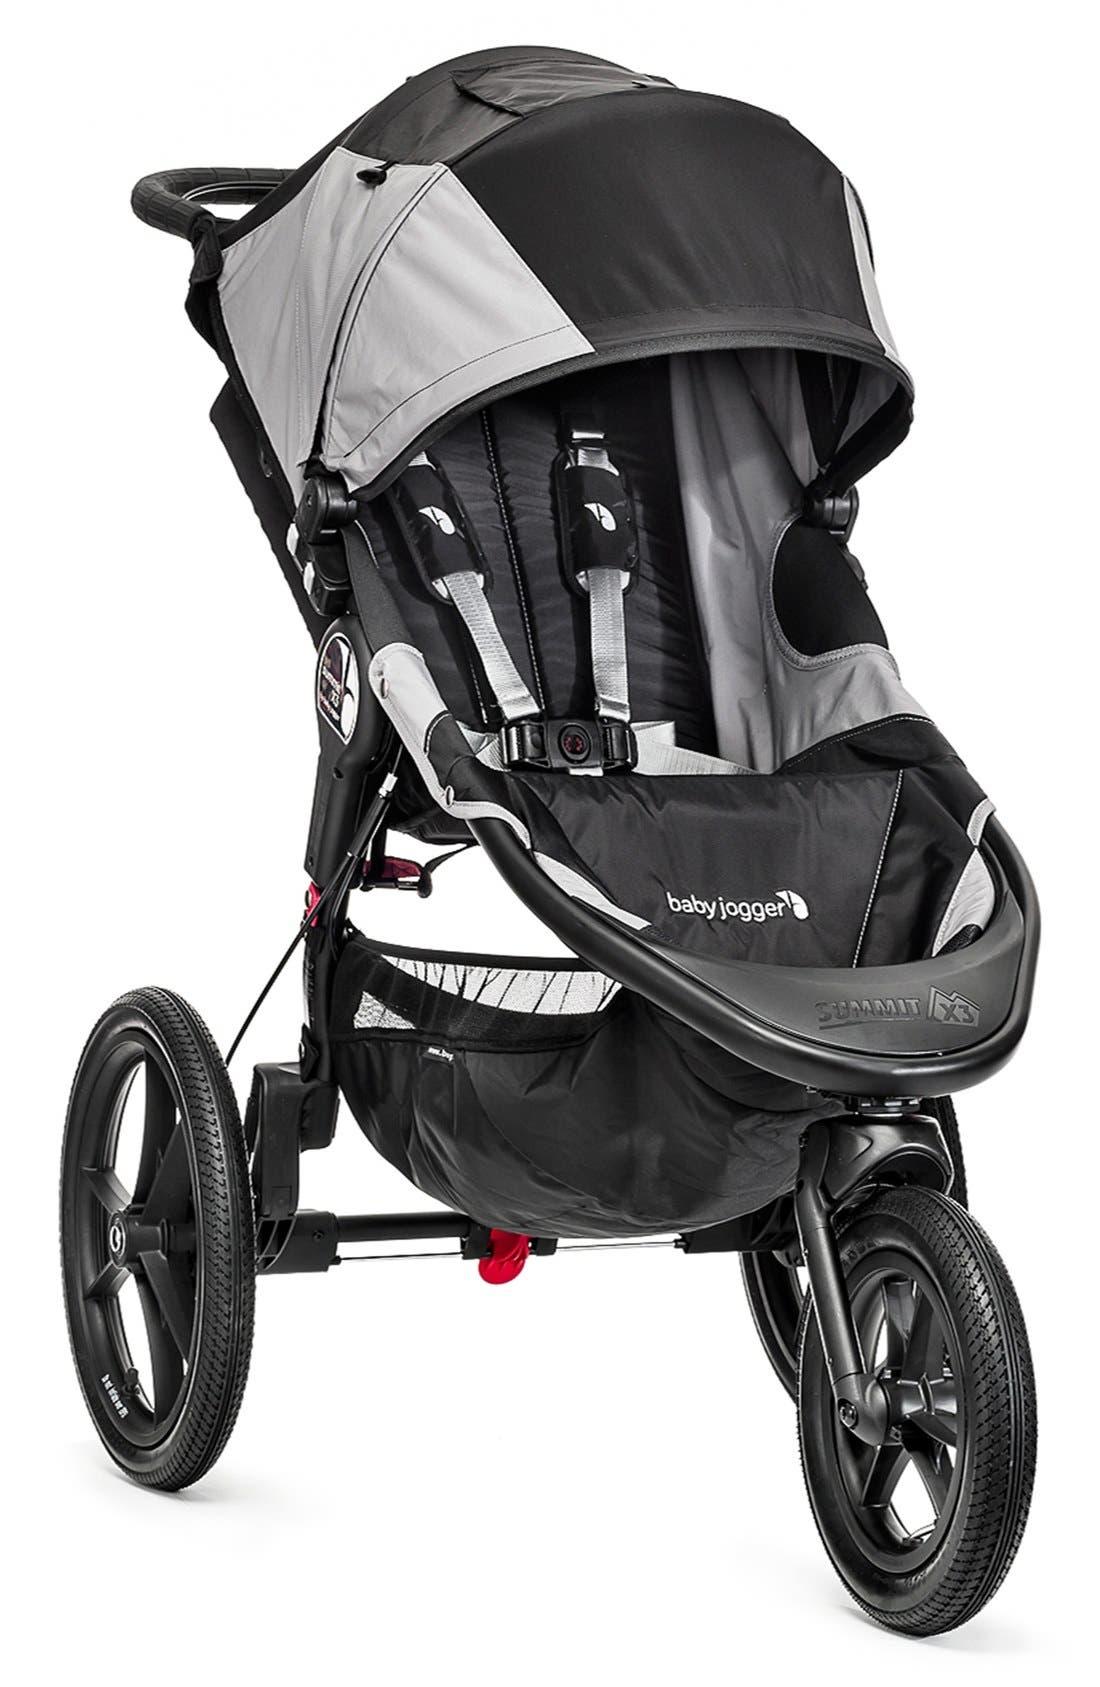 Alternate Image 1 Selected - Baby Jogger 'Summit X3' Single Jogging Stroller